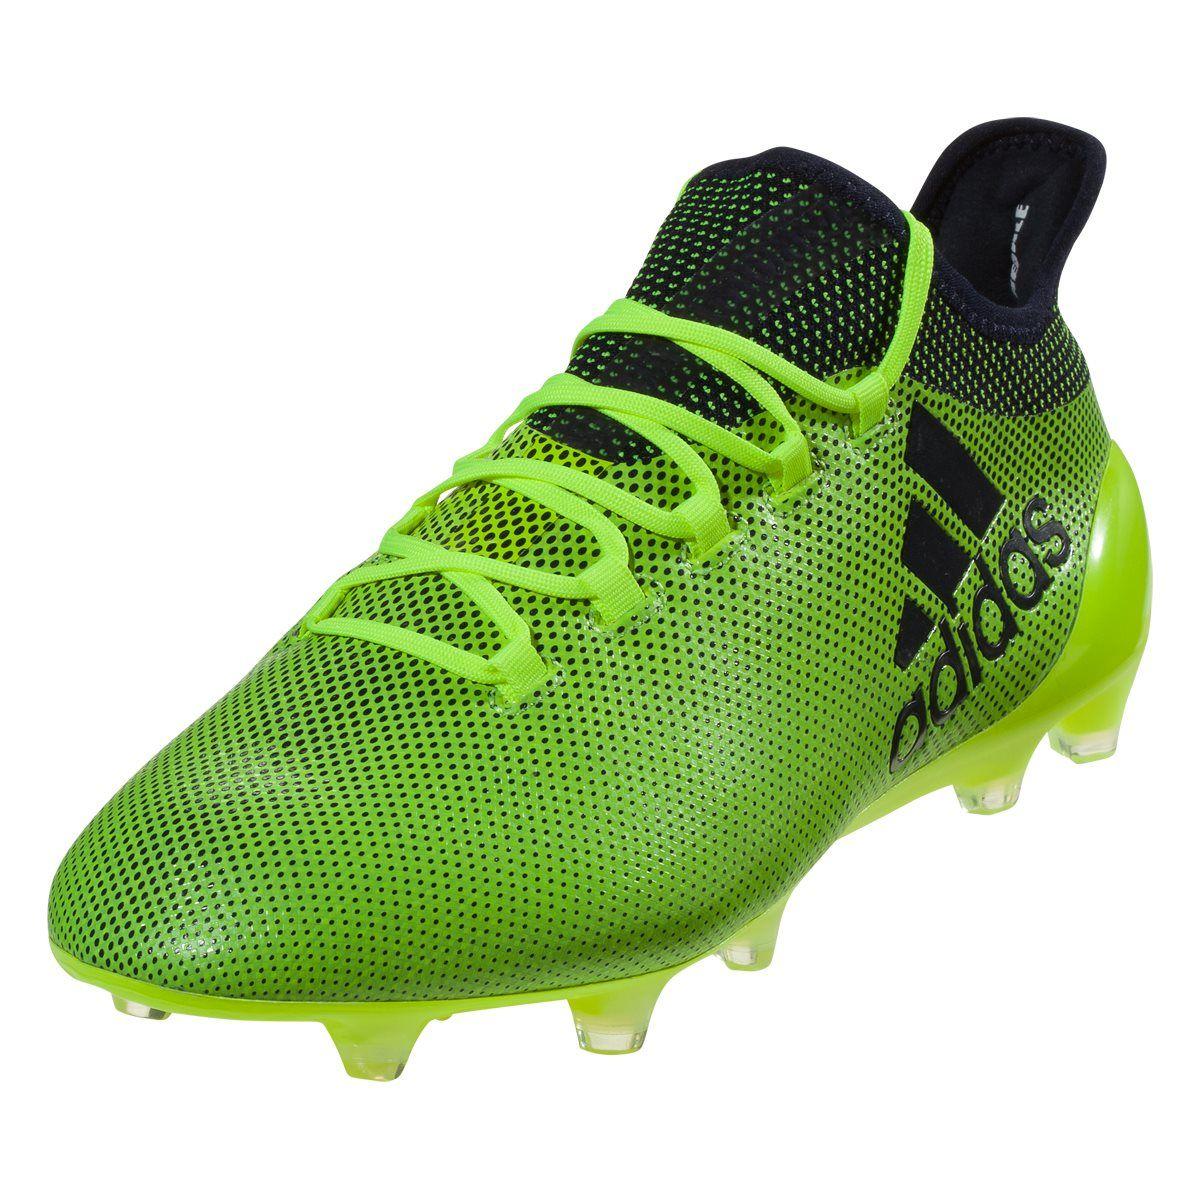 Adidas Ocean Storm Pack Adidas X 17 1 Fg Soccer Cleats Best Soccer Cleats Cleats Mens Soccer Cleats